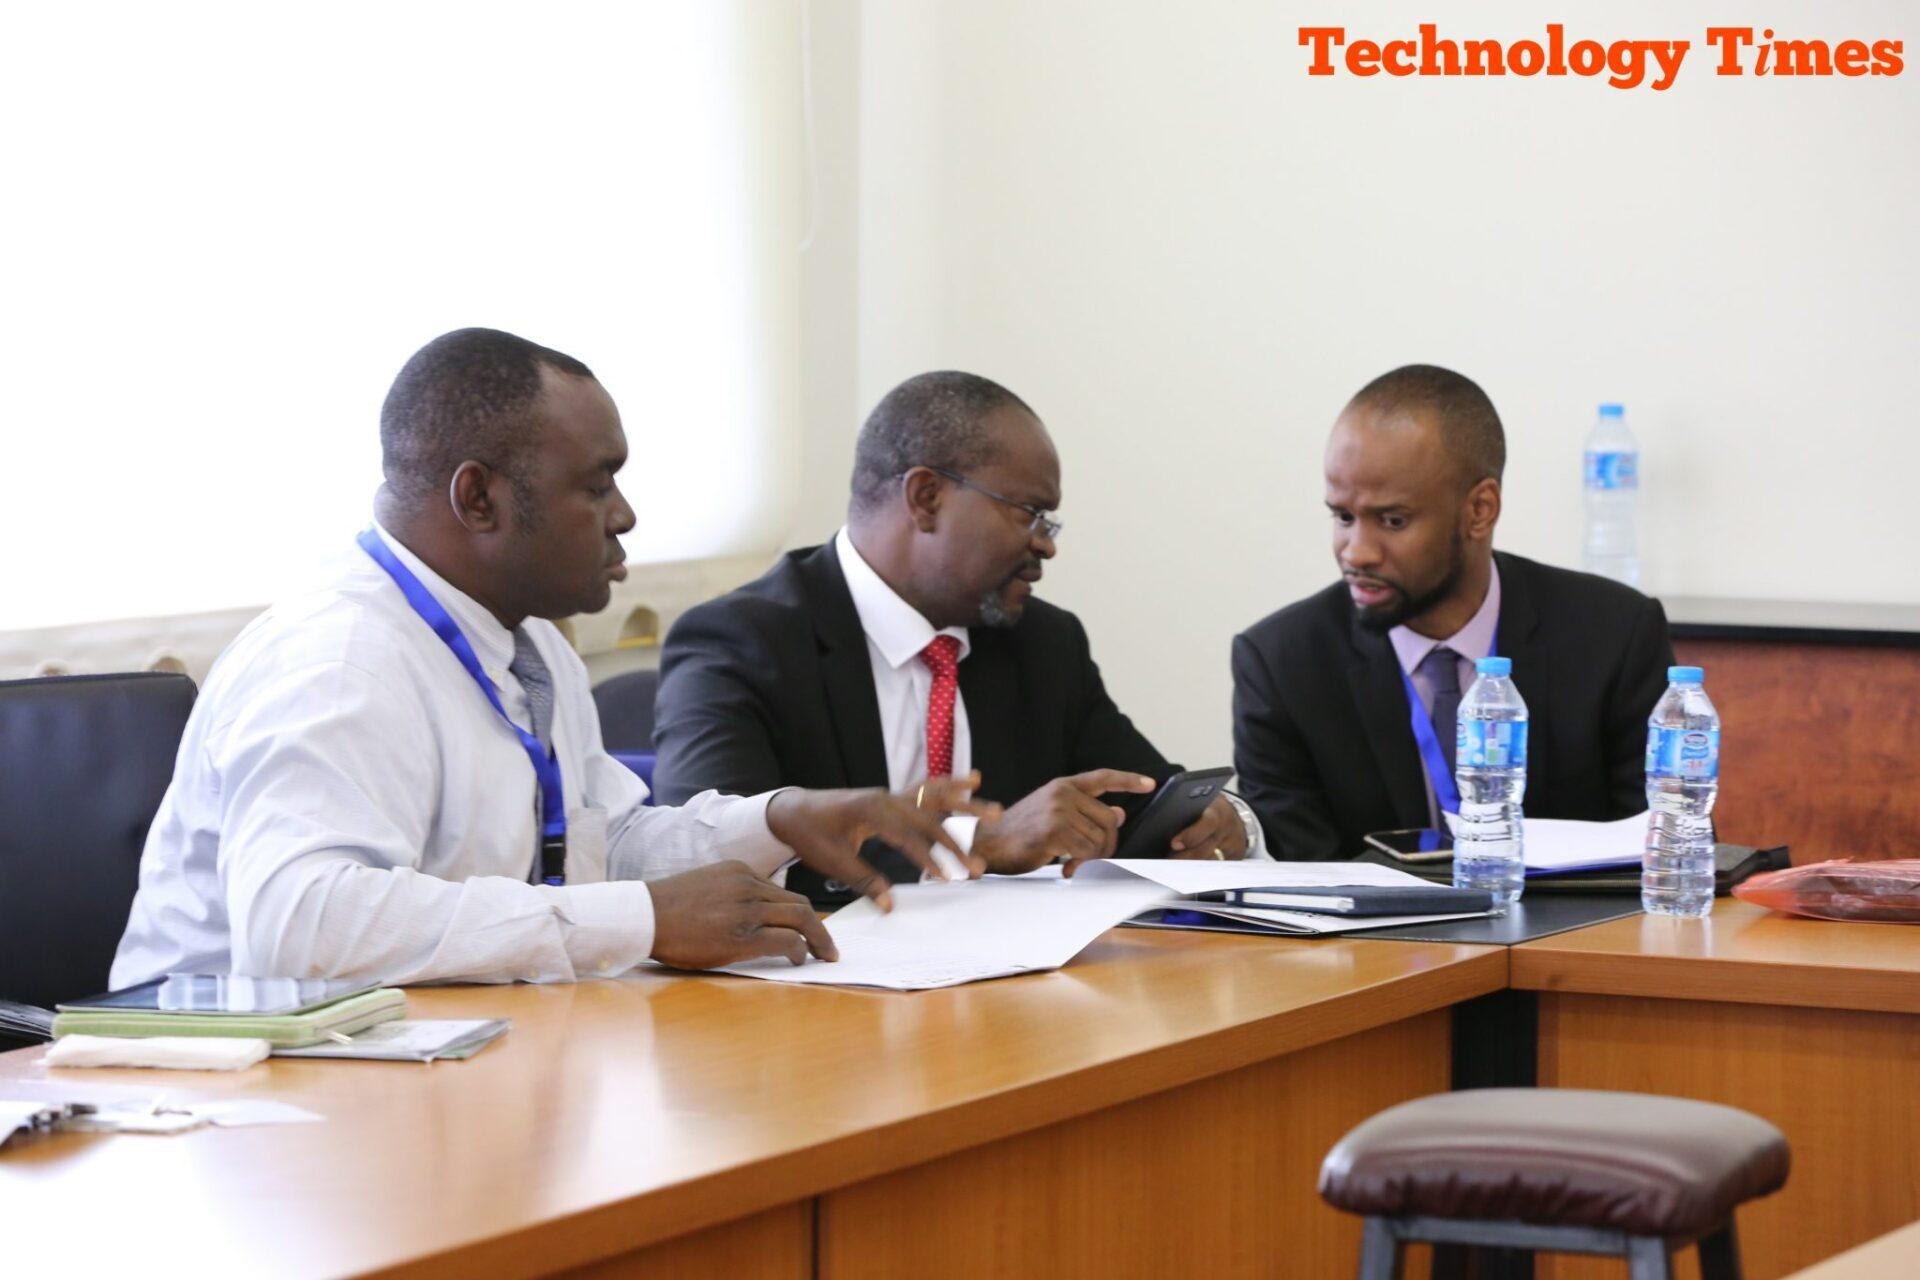 , Photos | Nigeria Internet Governance Forum (NIGF 2018) in Abuja, Technology Times